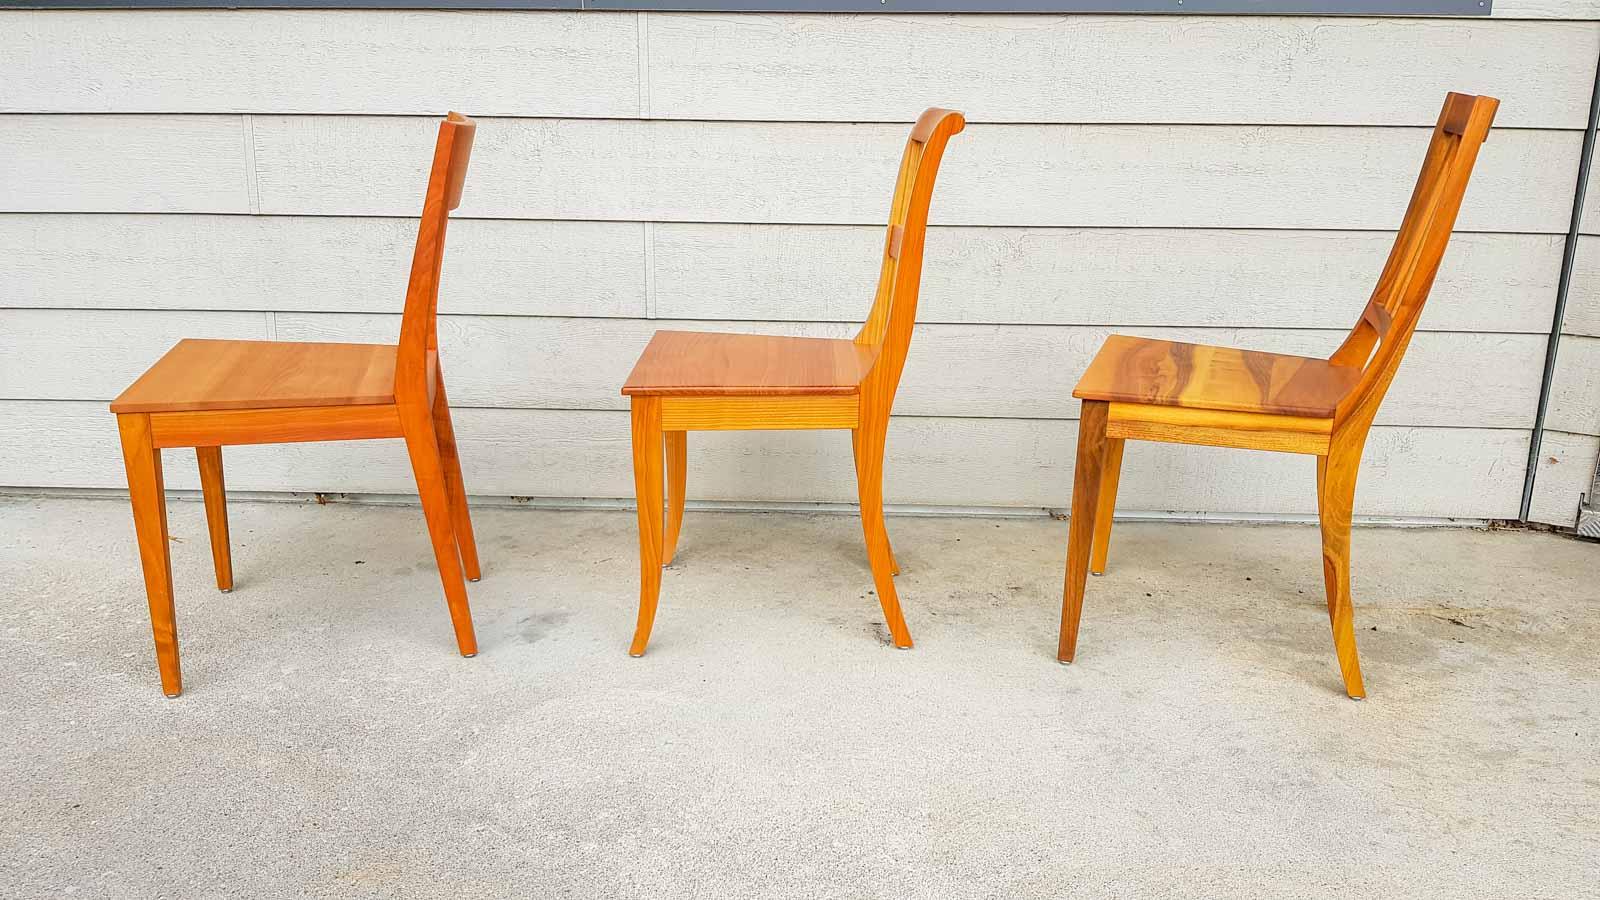 Wooddesign_Holzstühle_Holzstuhl (2)